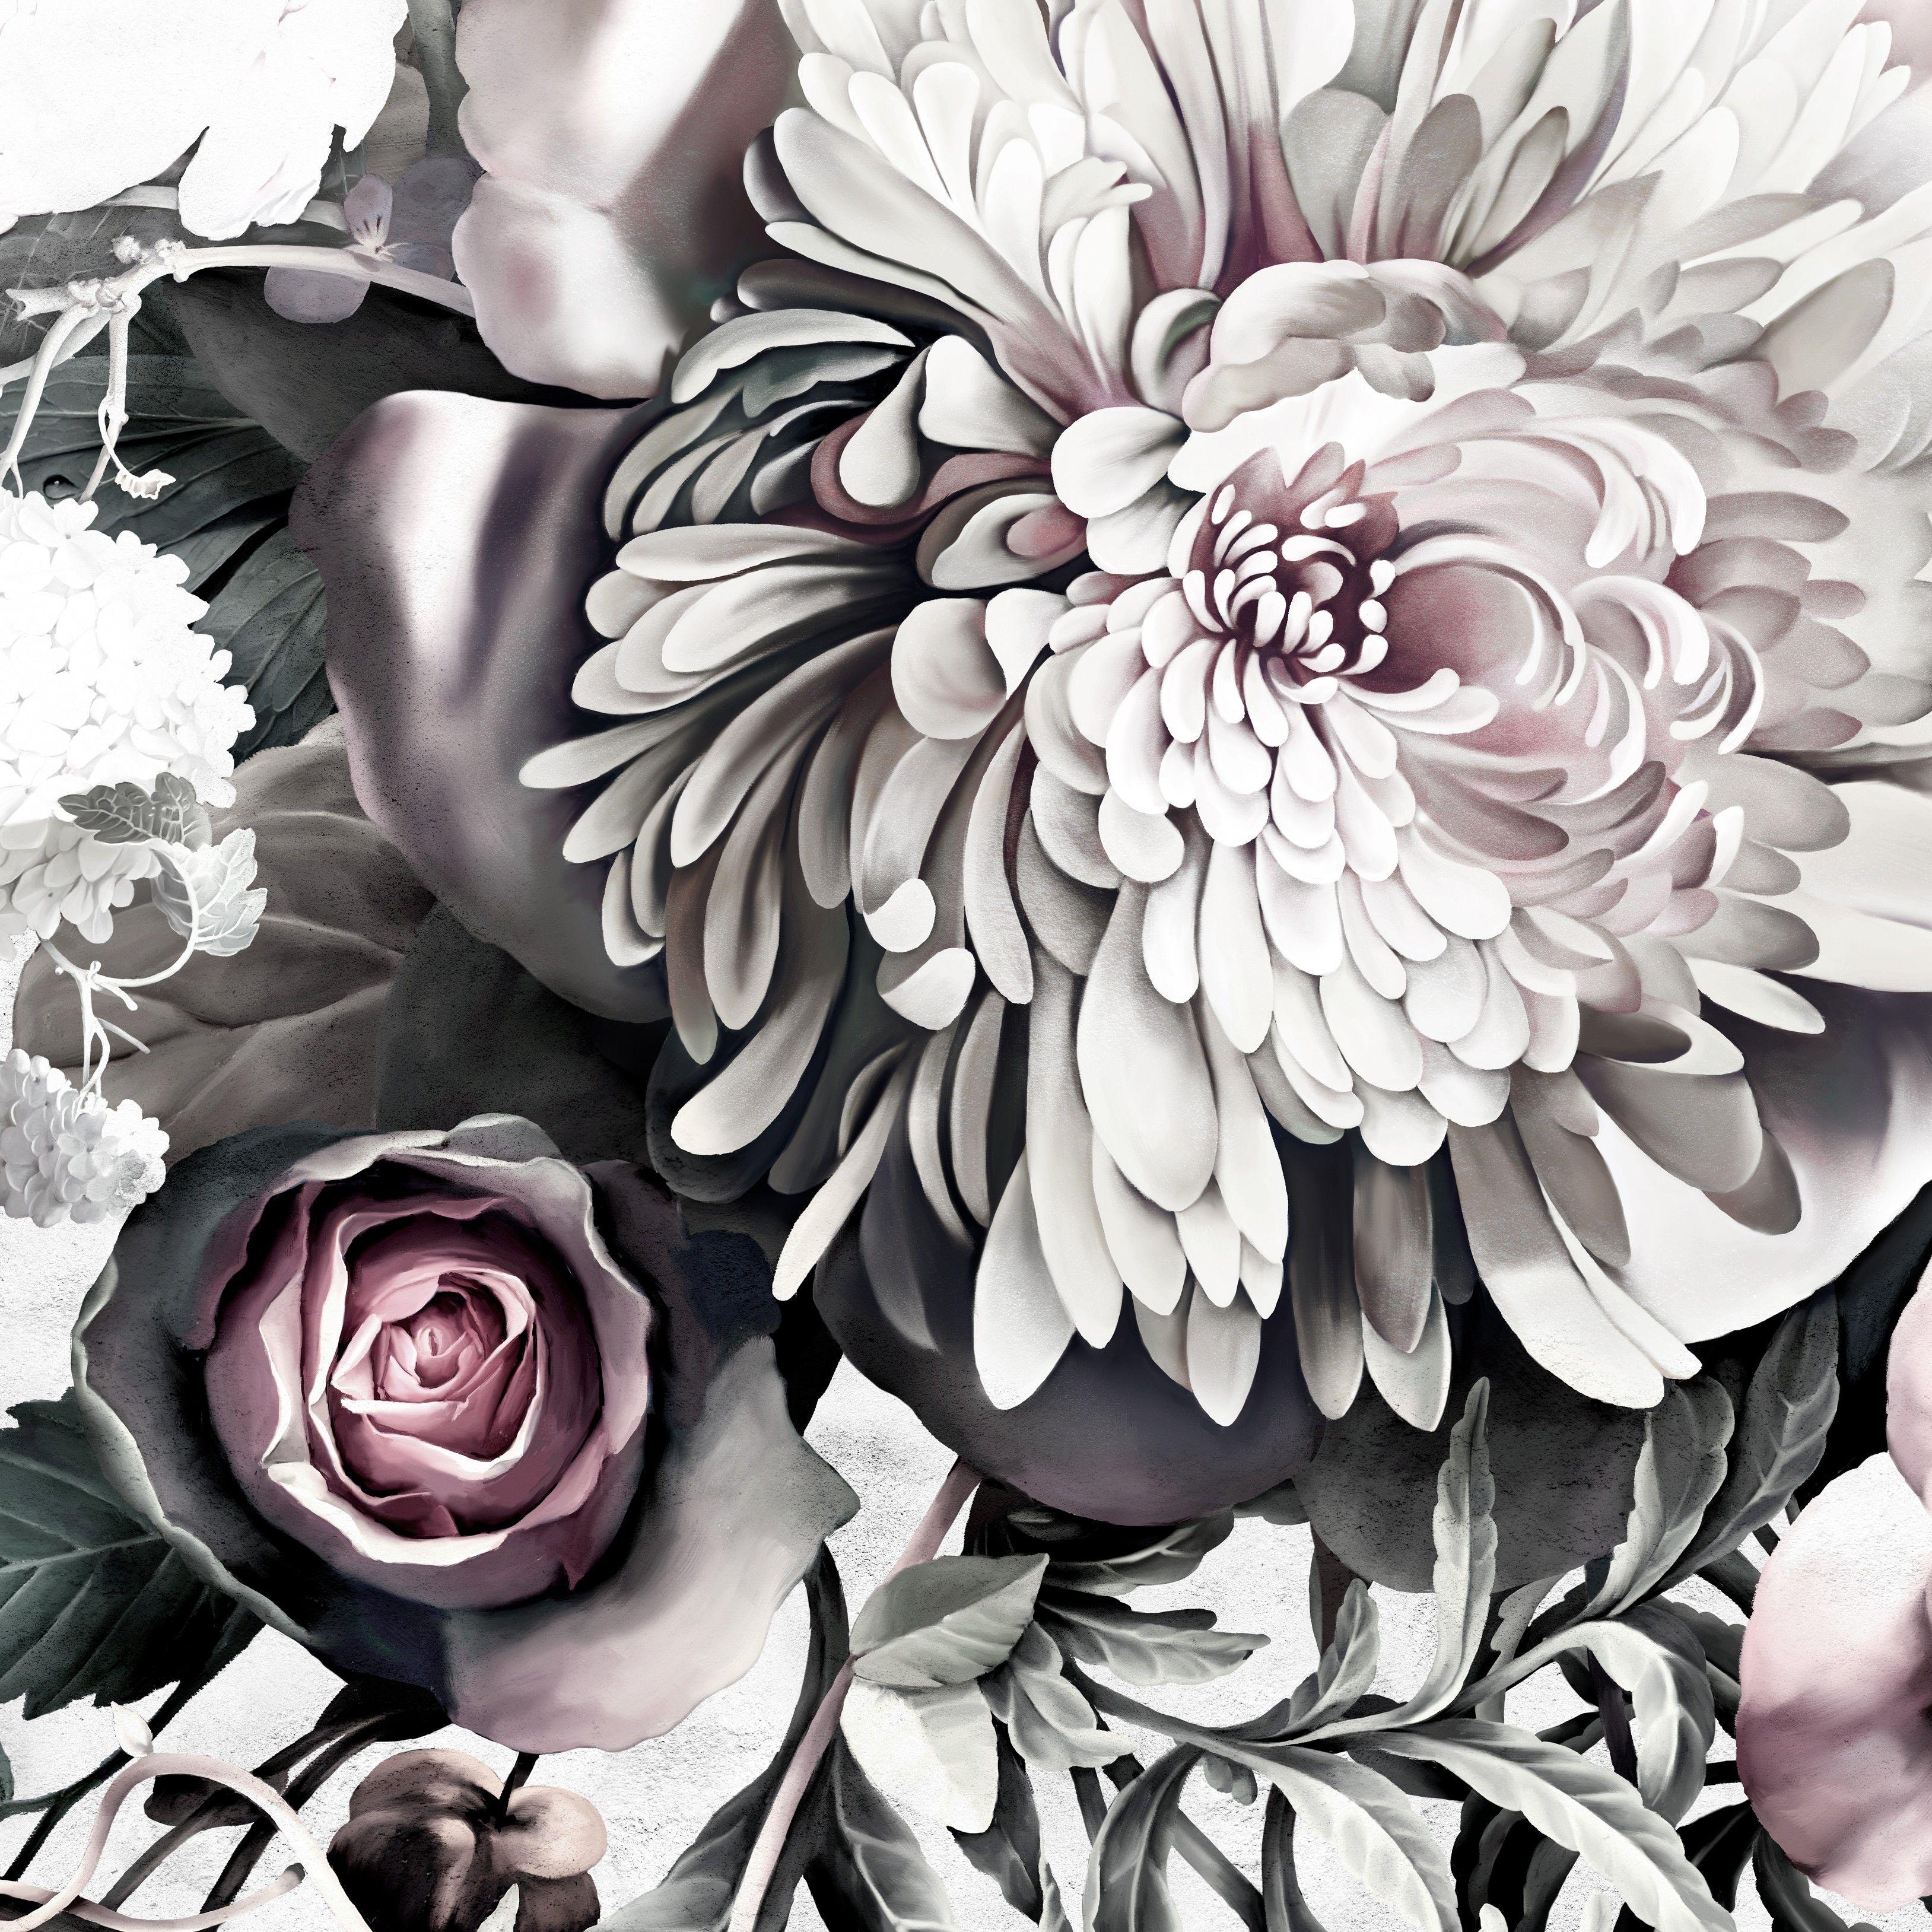 Black floral print wallpaper dark floral wallpaper by ellie cashman - Dark Floral Ii Light Fresco Floral Wallpaper By Ellie Cashman Design